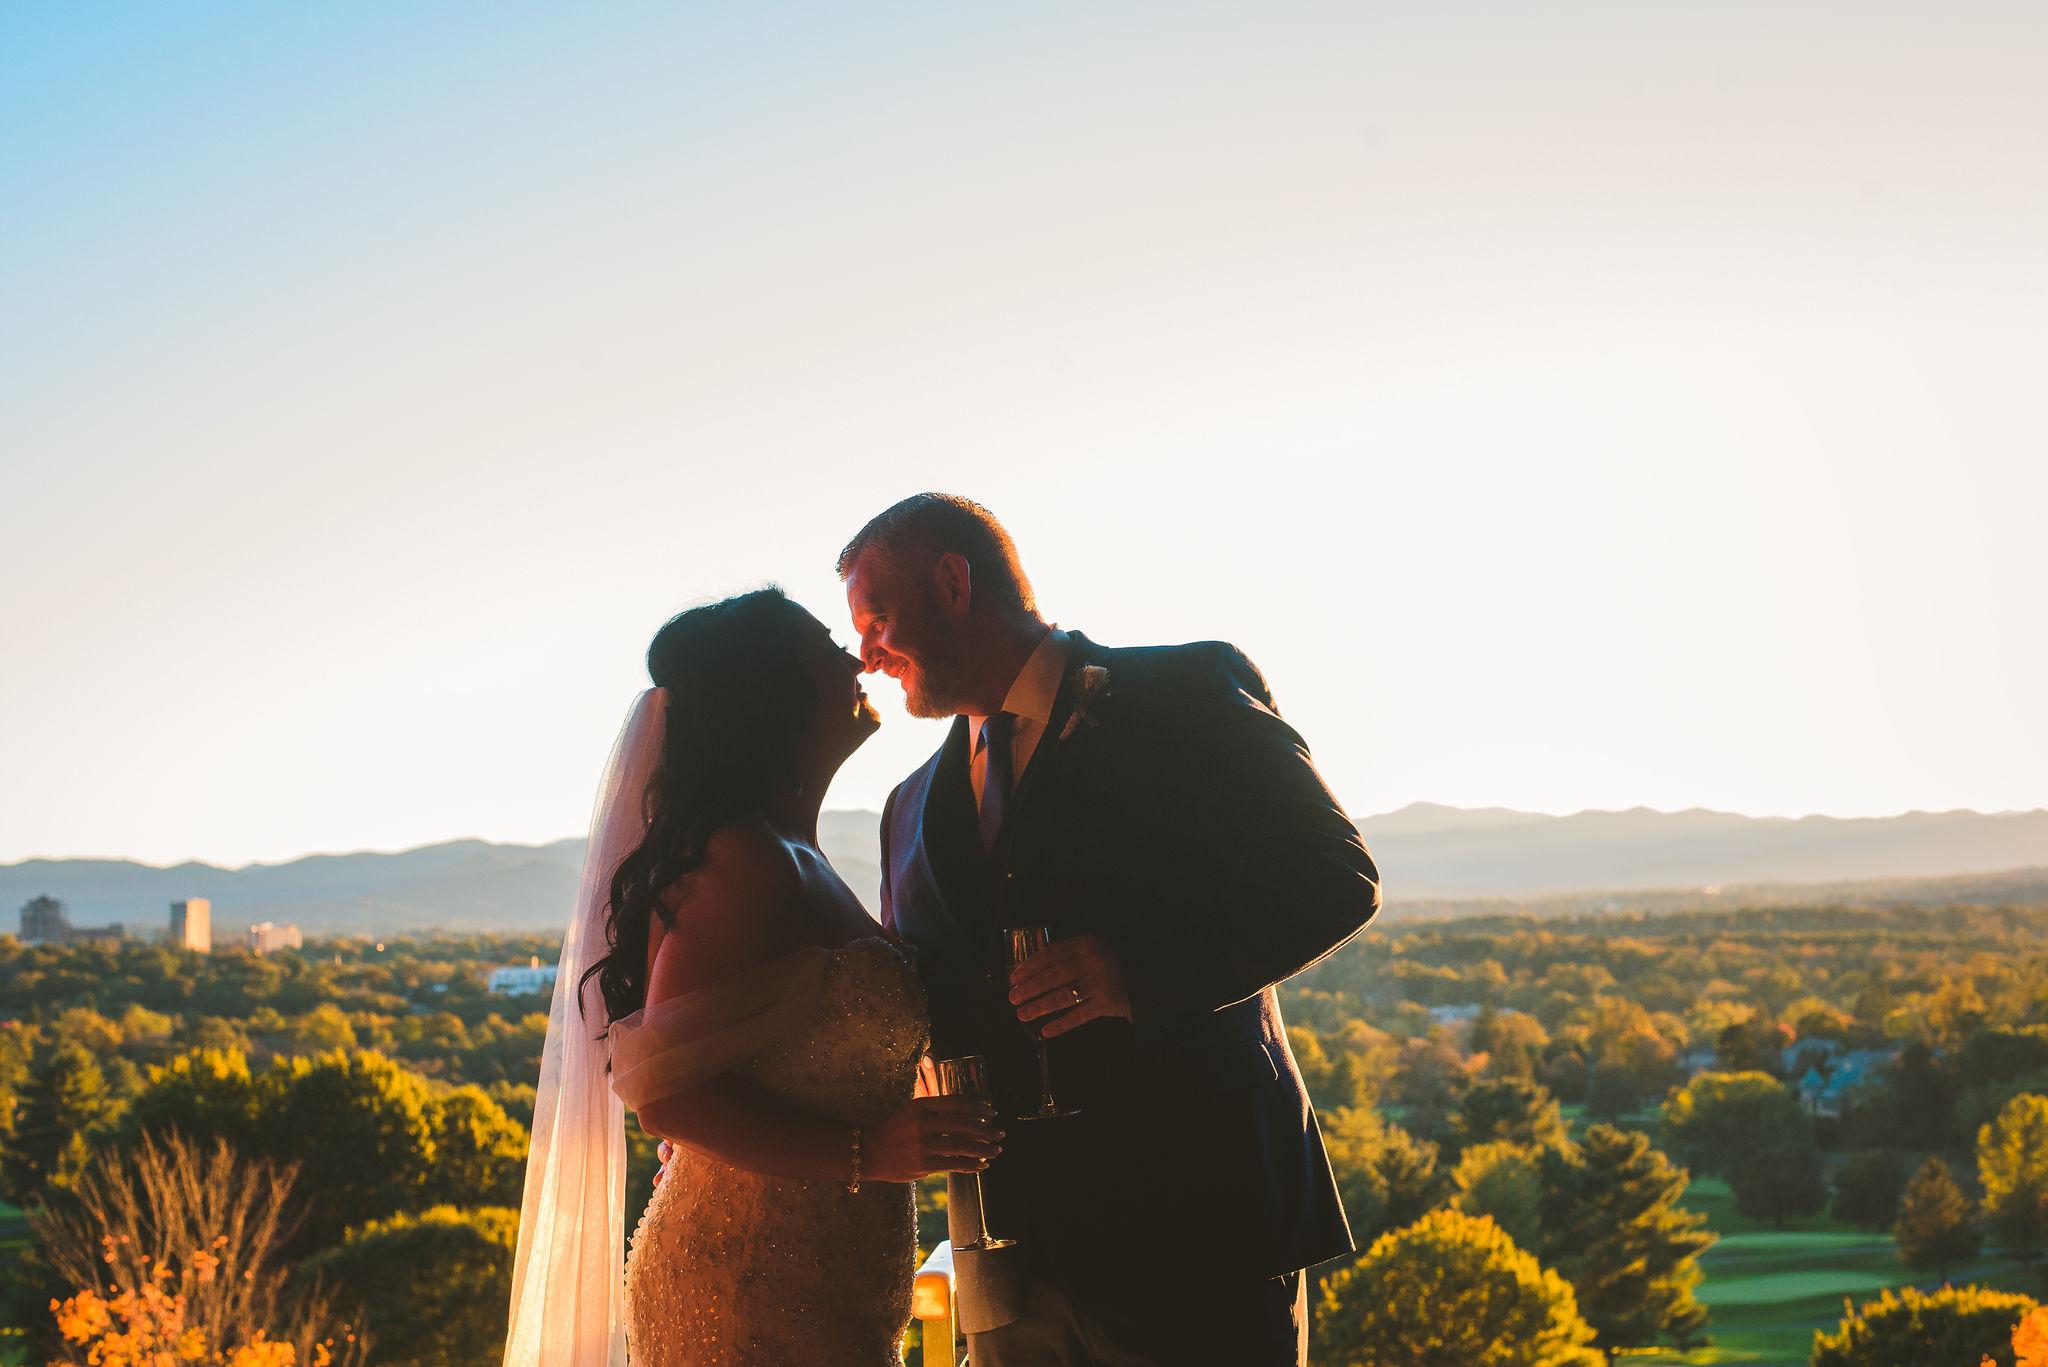 OMNI GROVE PARK INN wedding in ASHEVILLE, north carolina - breathtaking outdoor BLUE RIDGE mountain wedding ceremony